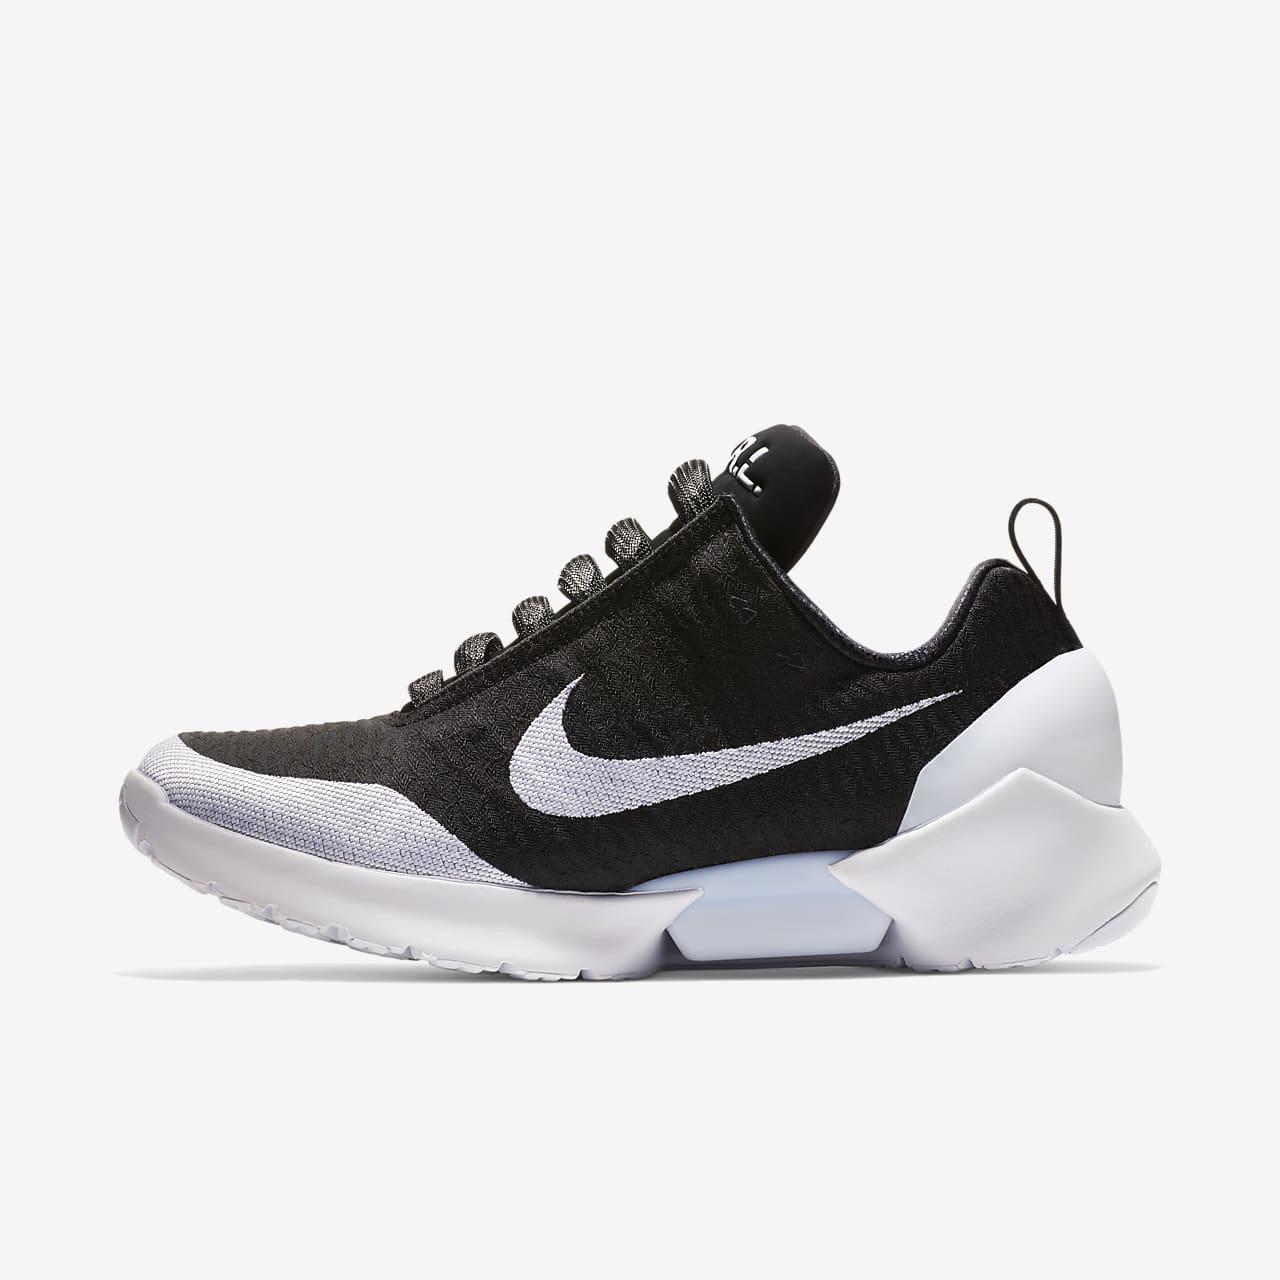 Nike HyperAdapt 1.0 (UK Plug) Men's